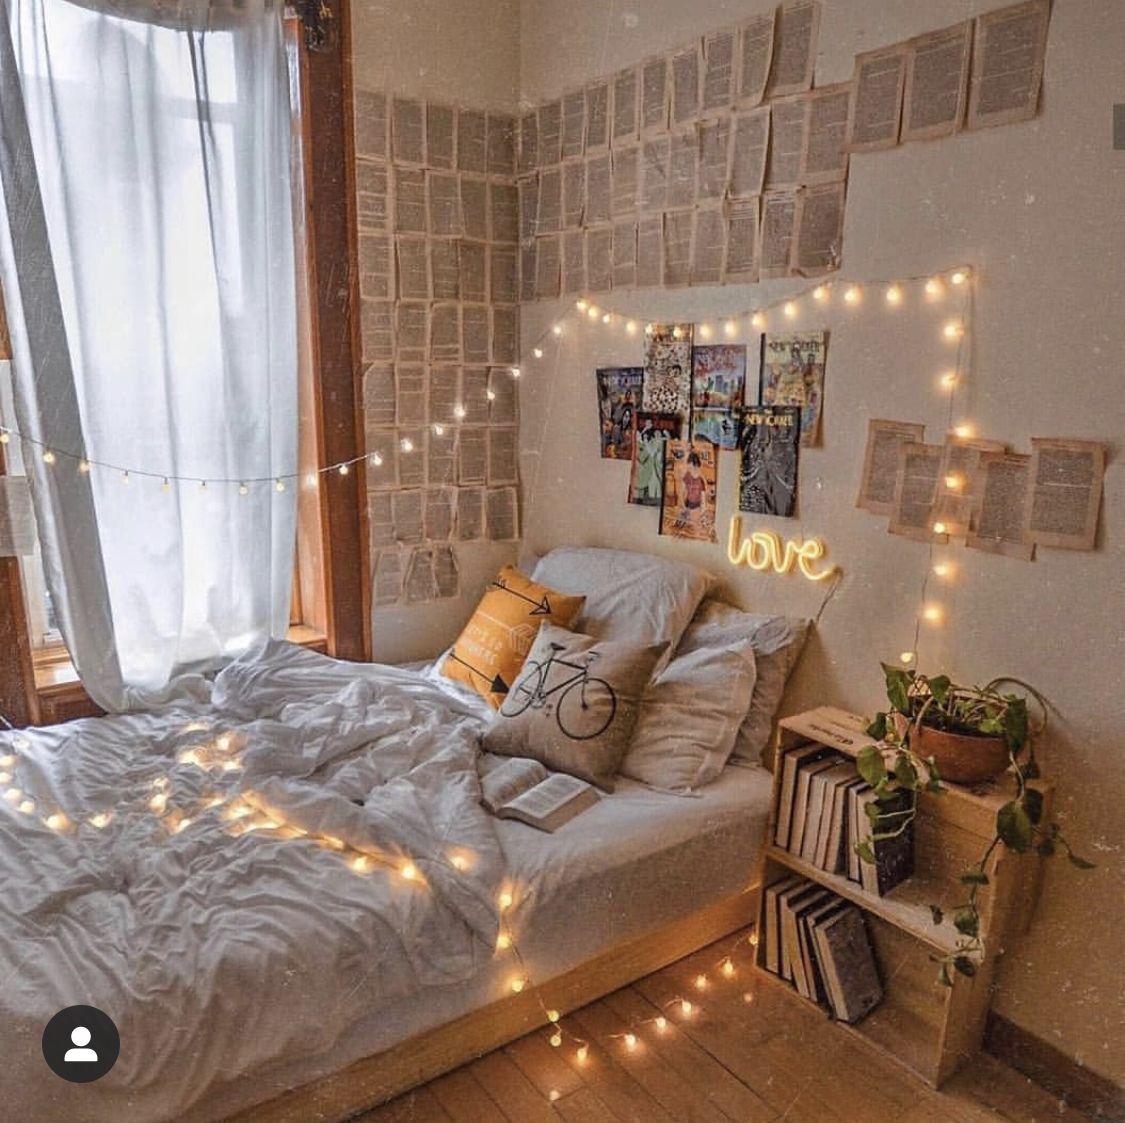 Pin by Amanda on Diy Home | Aesthetic room decor ...